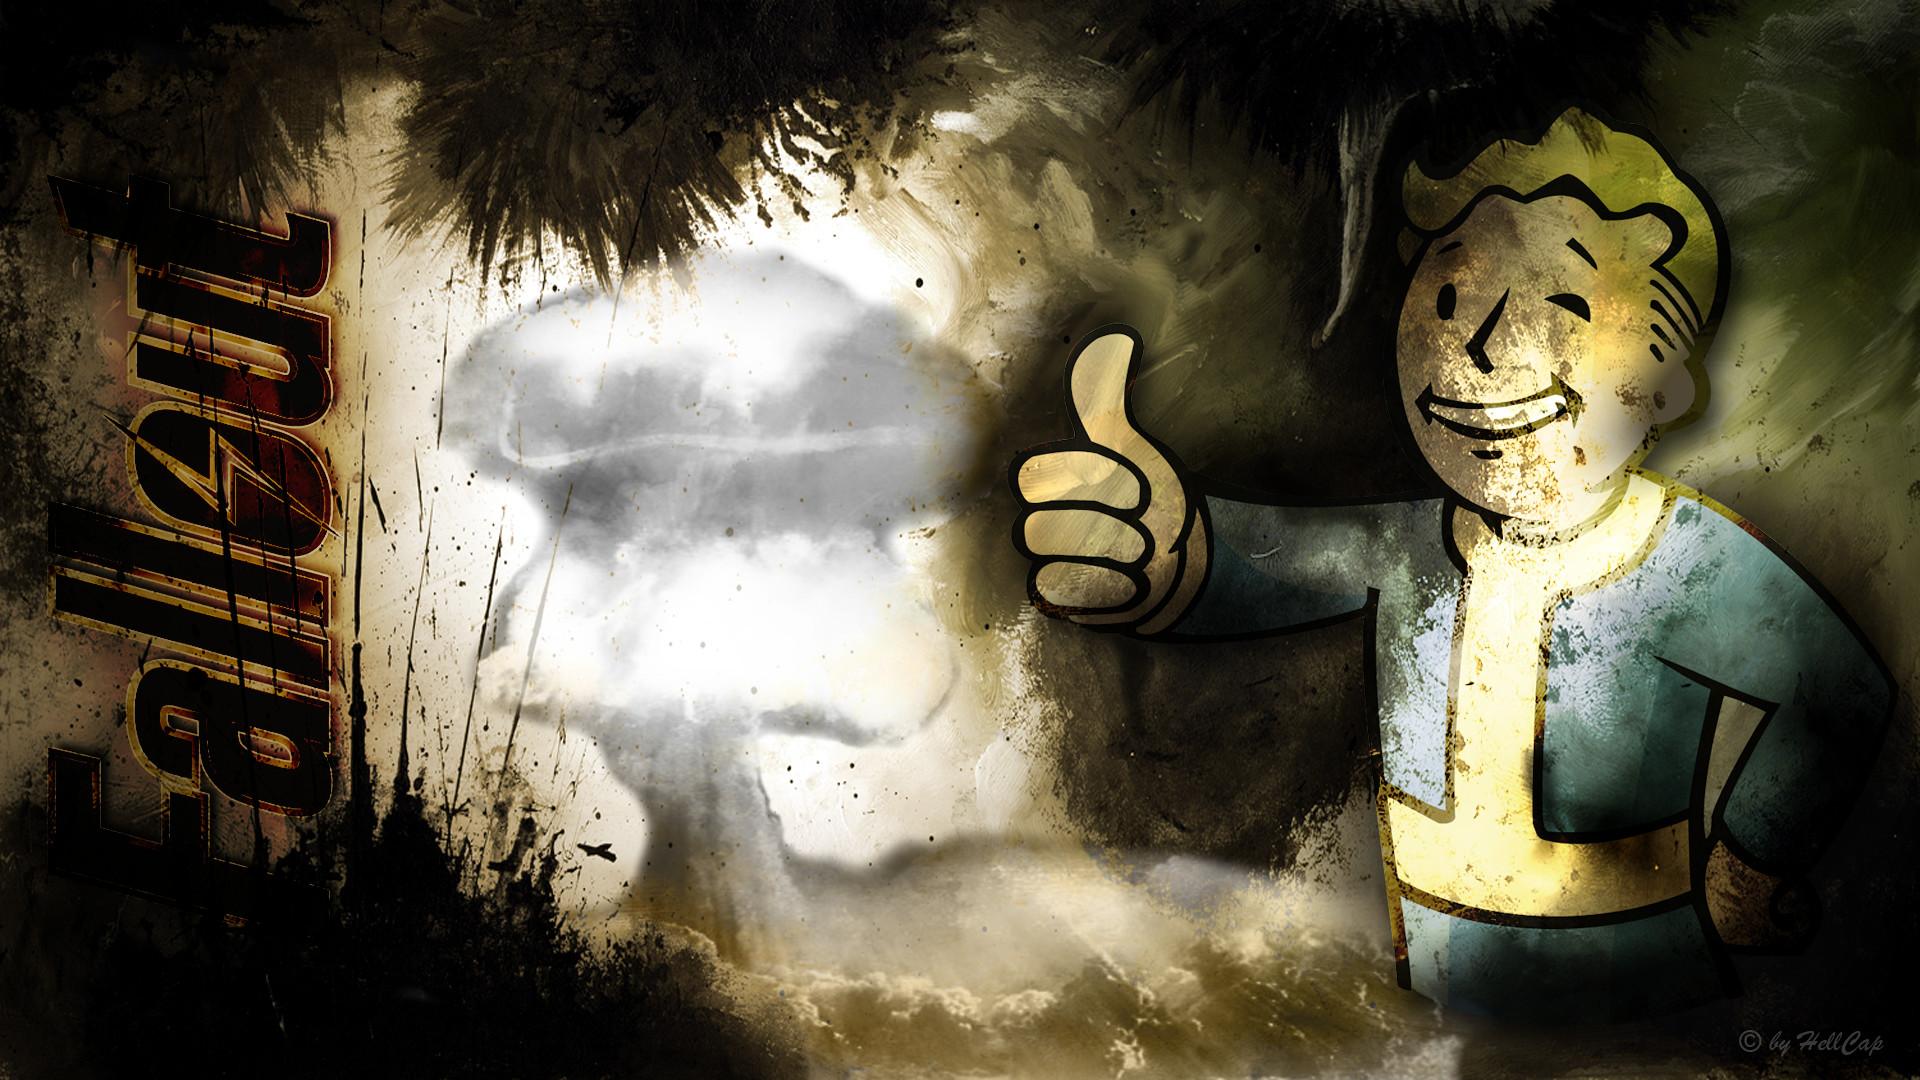 fallout vault boy wallpaper by netbase fan art wallpaper games 2011 .